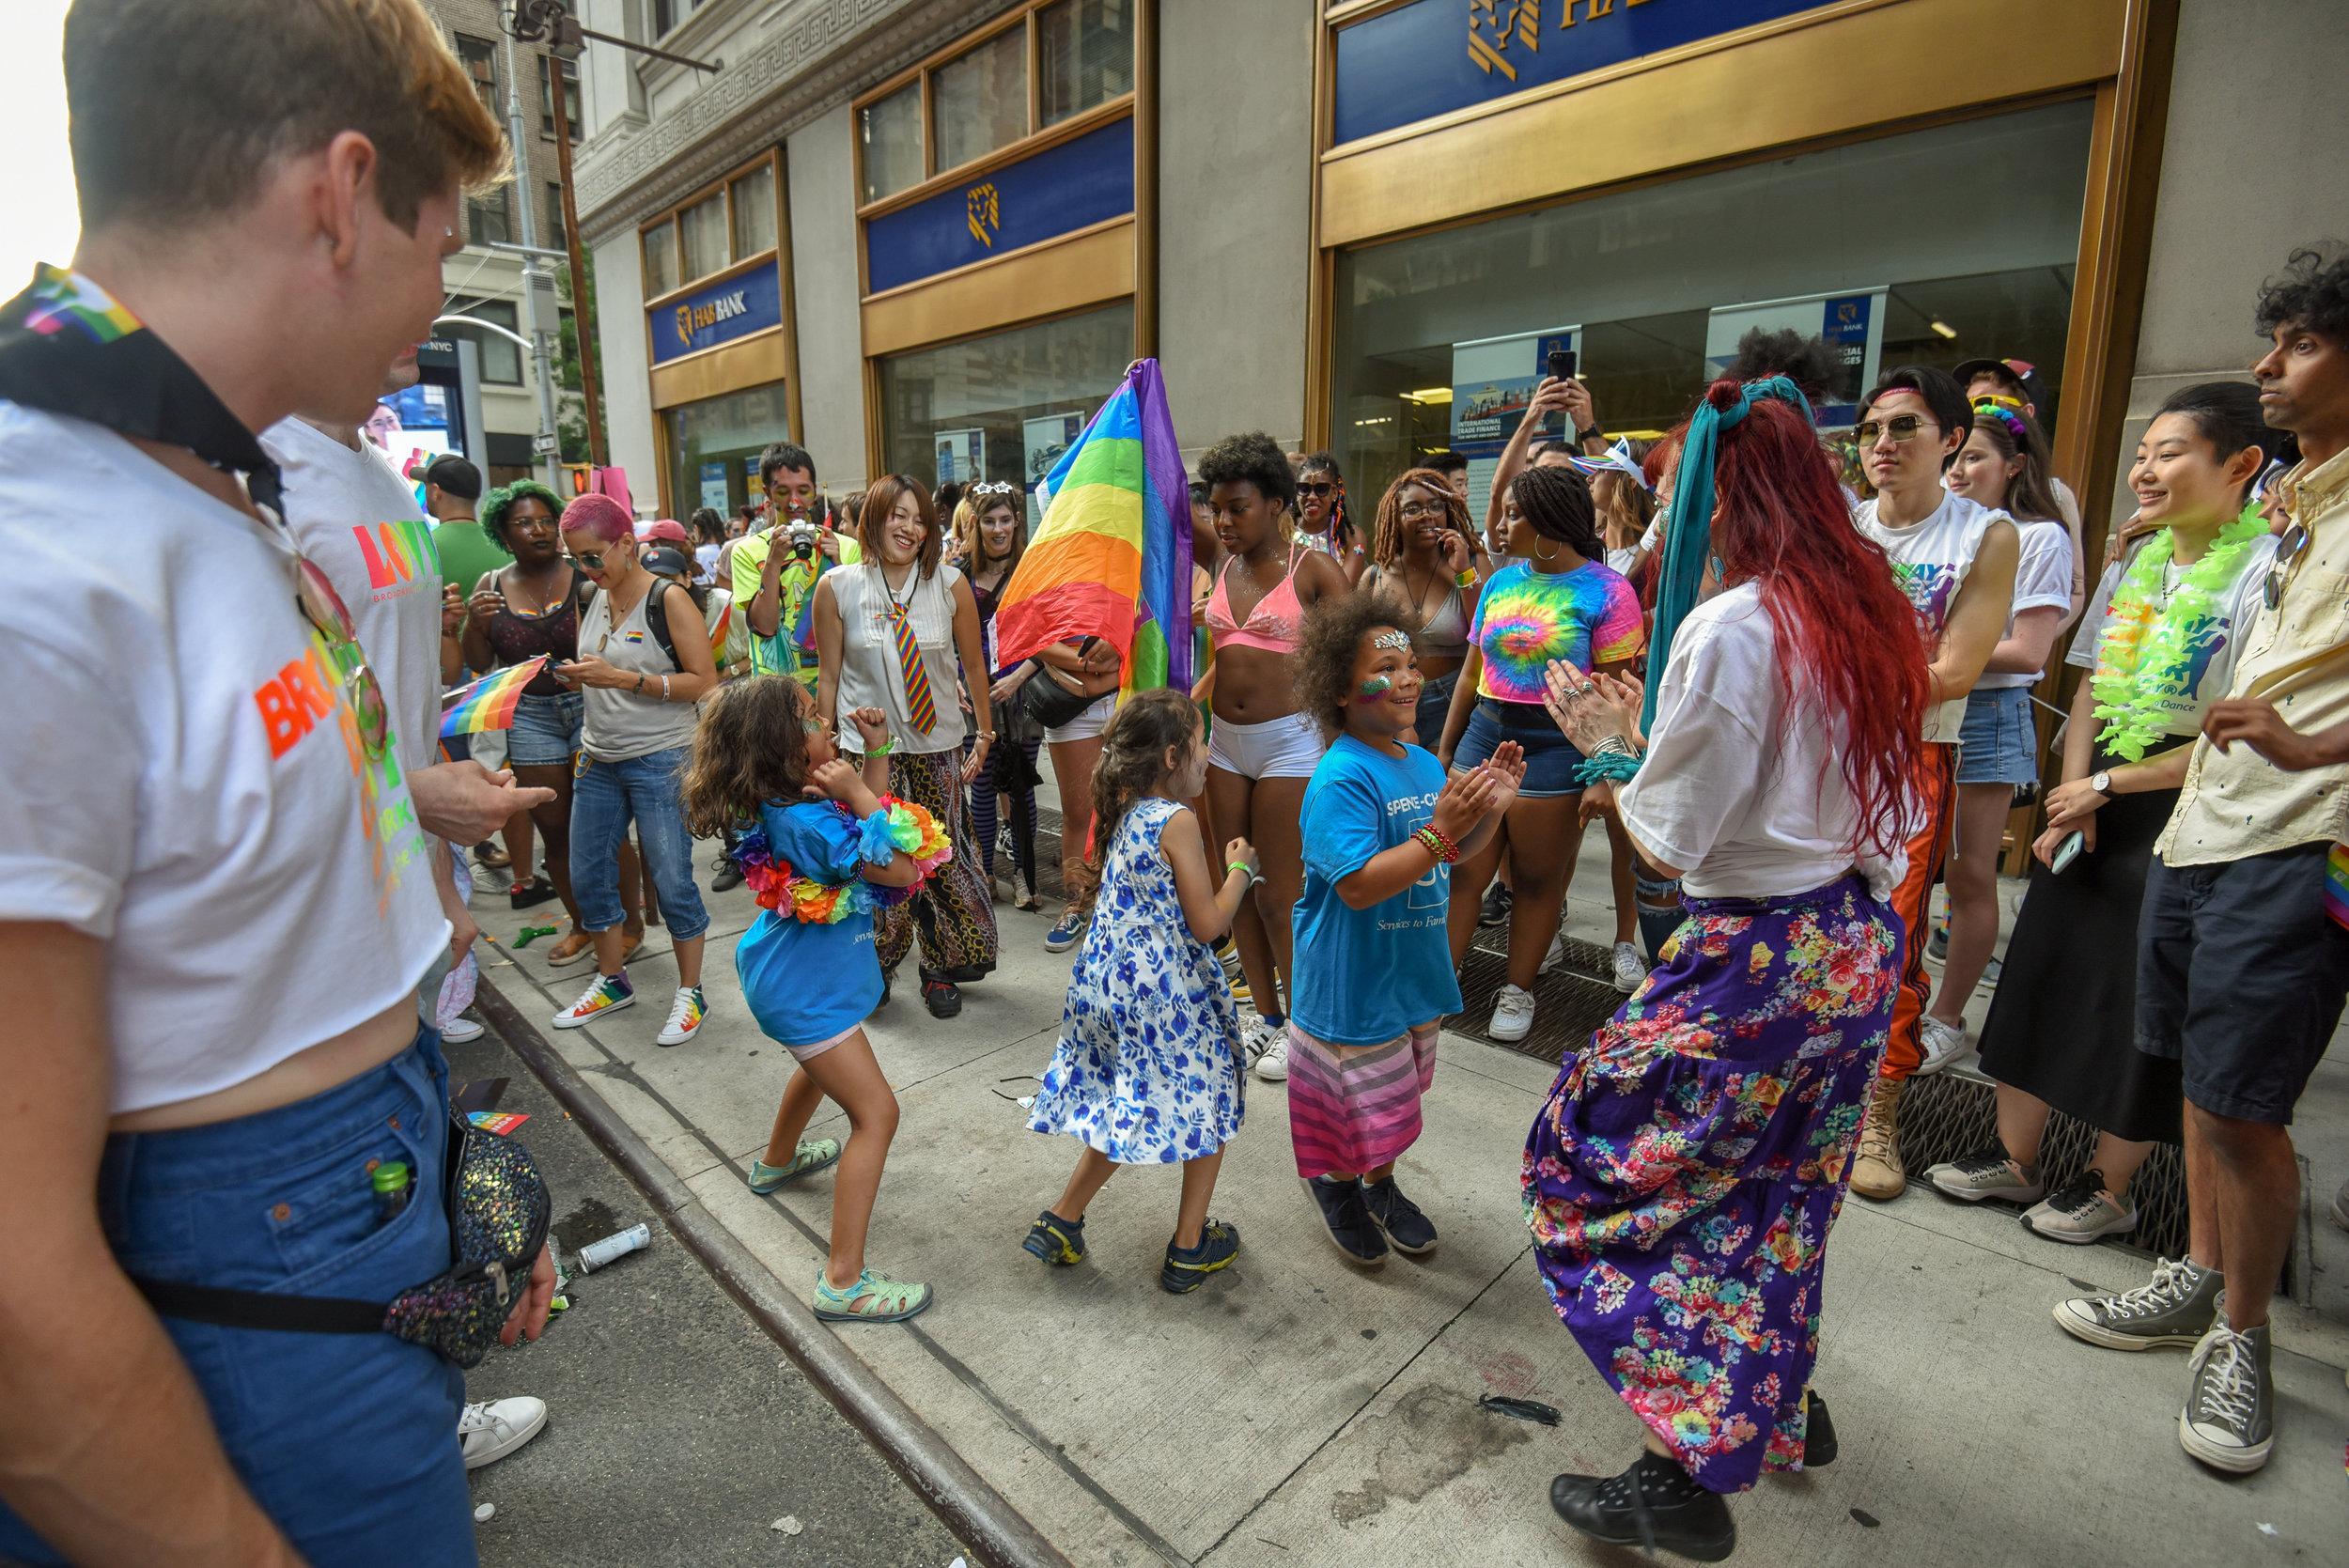 SC-PrideParade-2019_FE-193.jpg